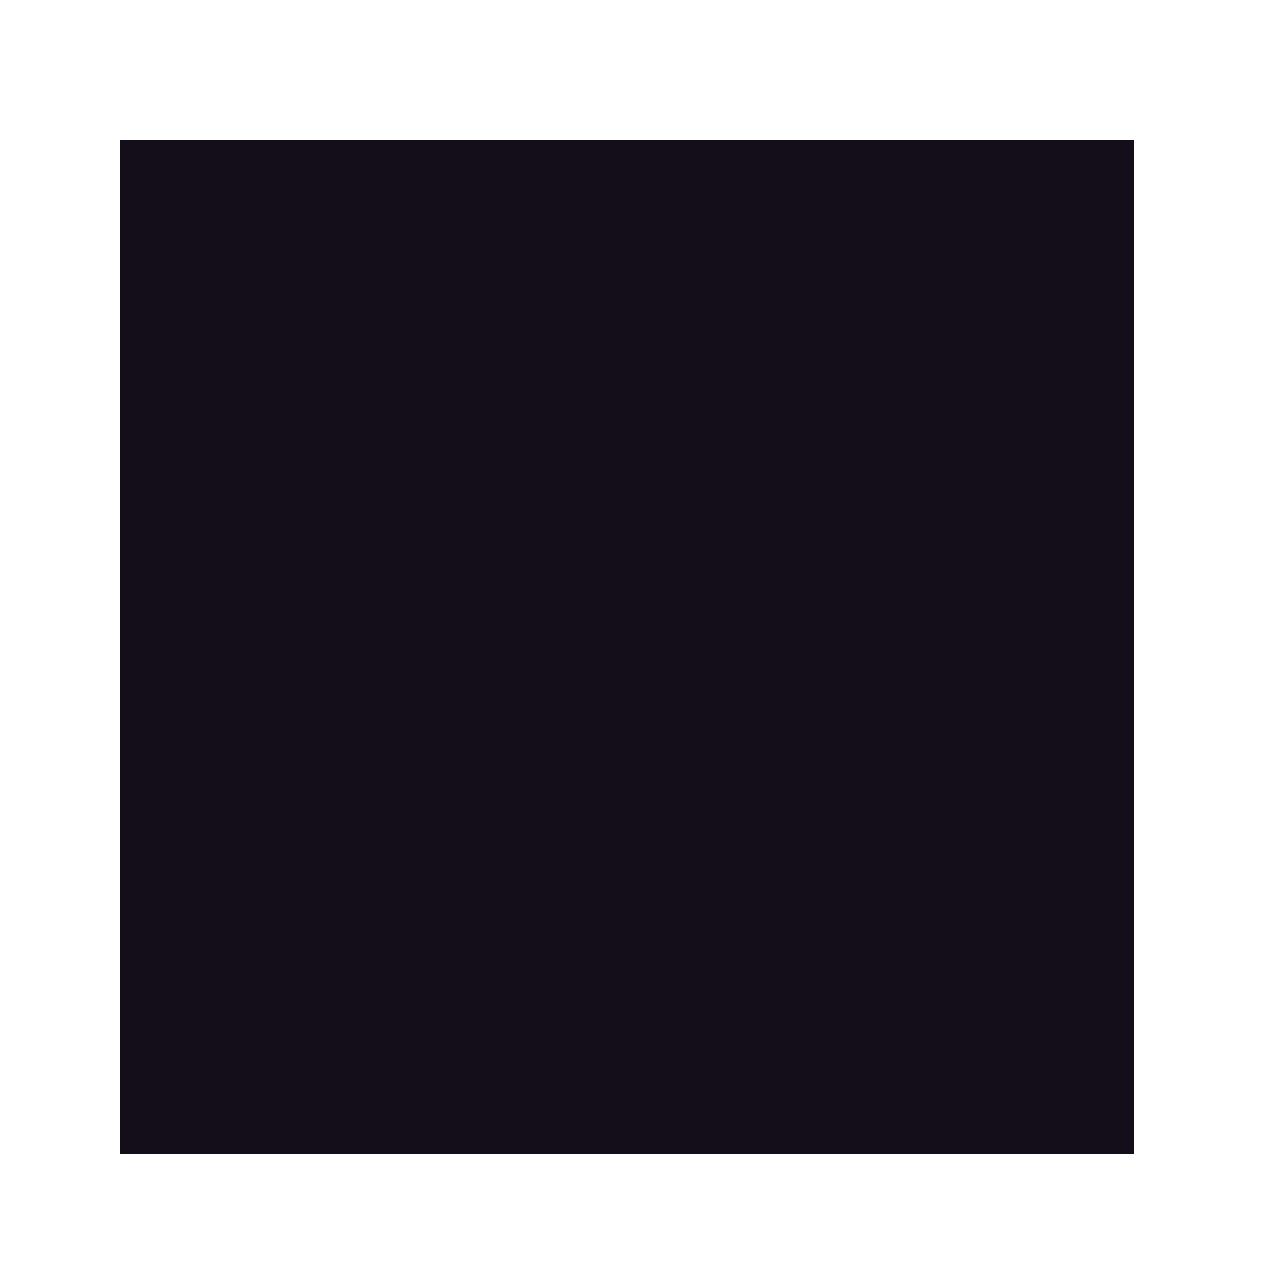 Jsm i-Media